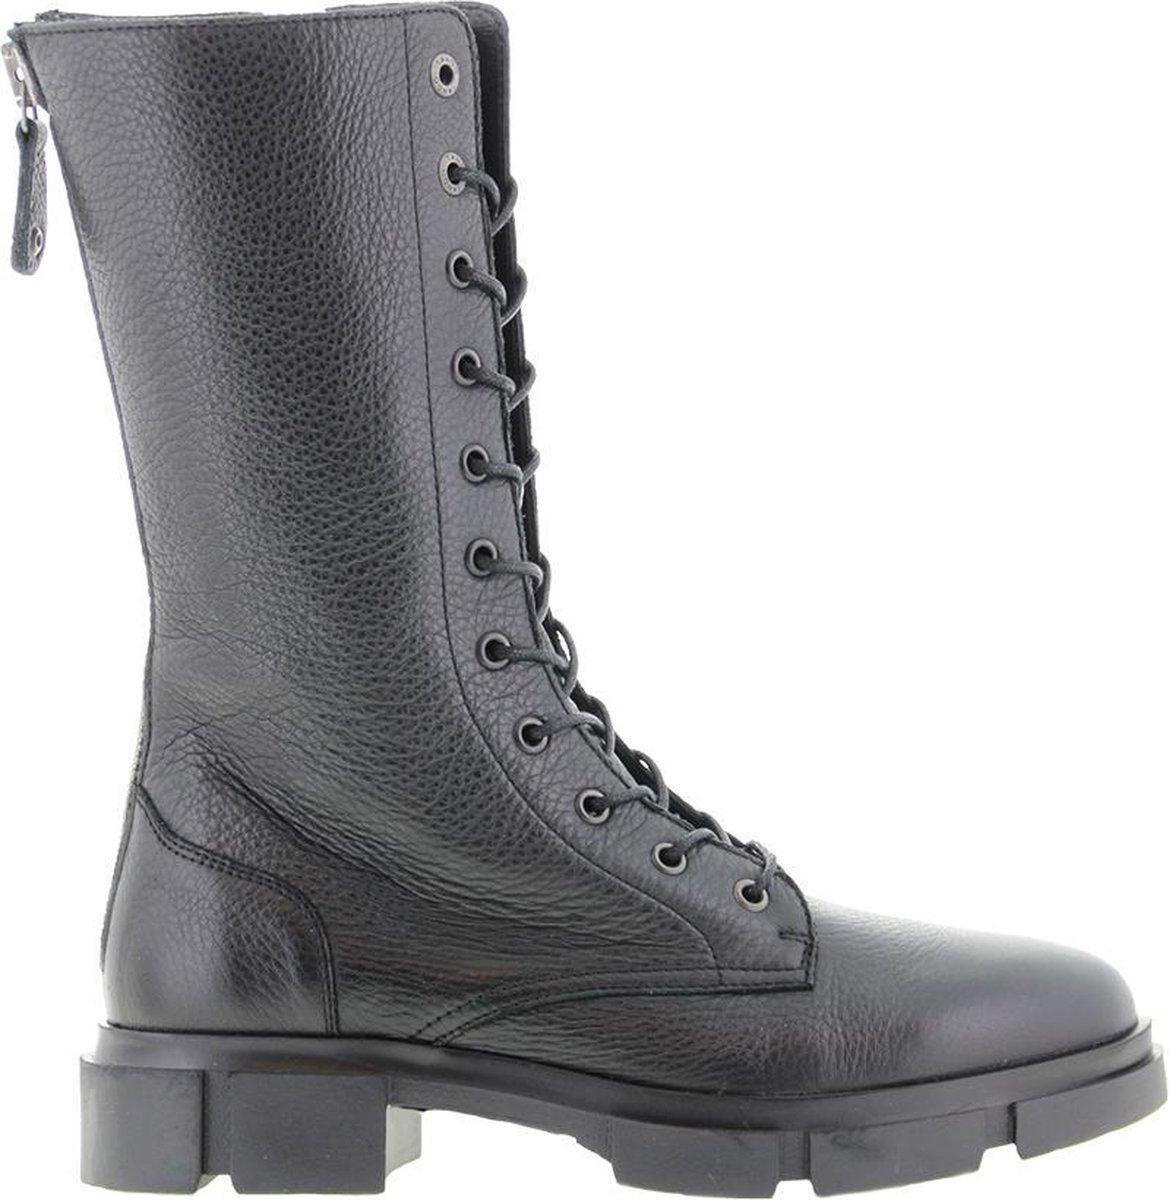 Tango | Romy 3-b black leather boot/metal zipper strap - black sole | Maat: 41